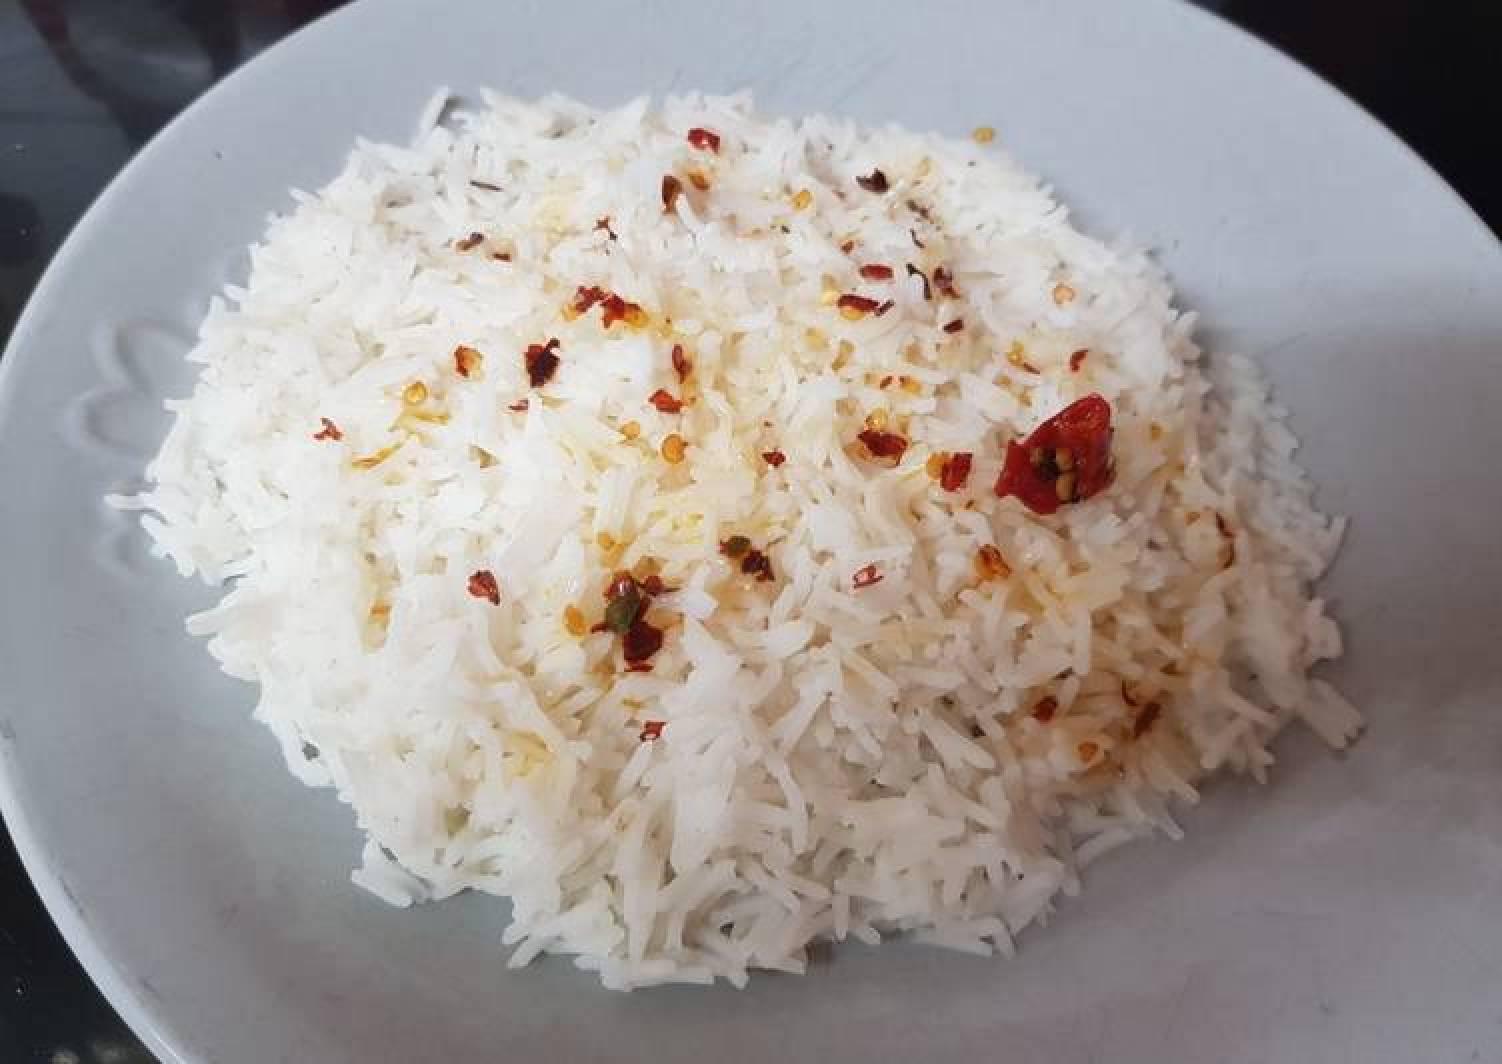 My Chilli Basmati Rice